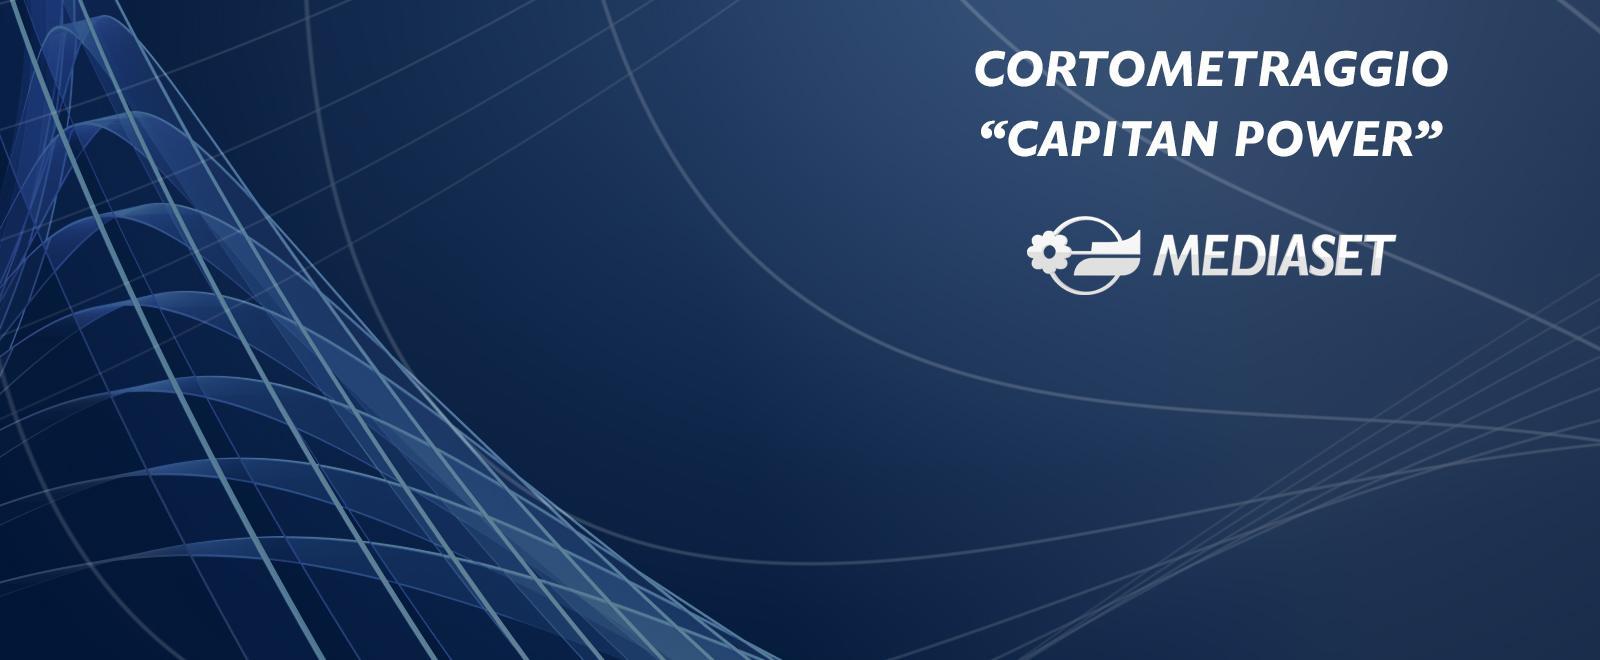 Capitan Power